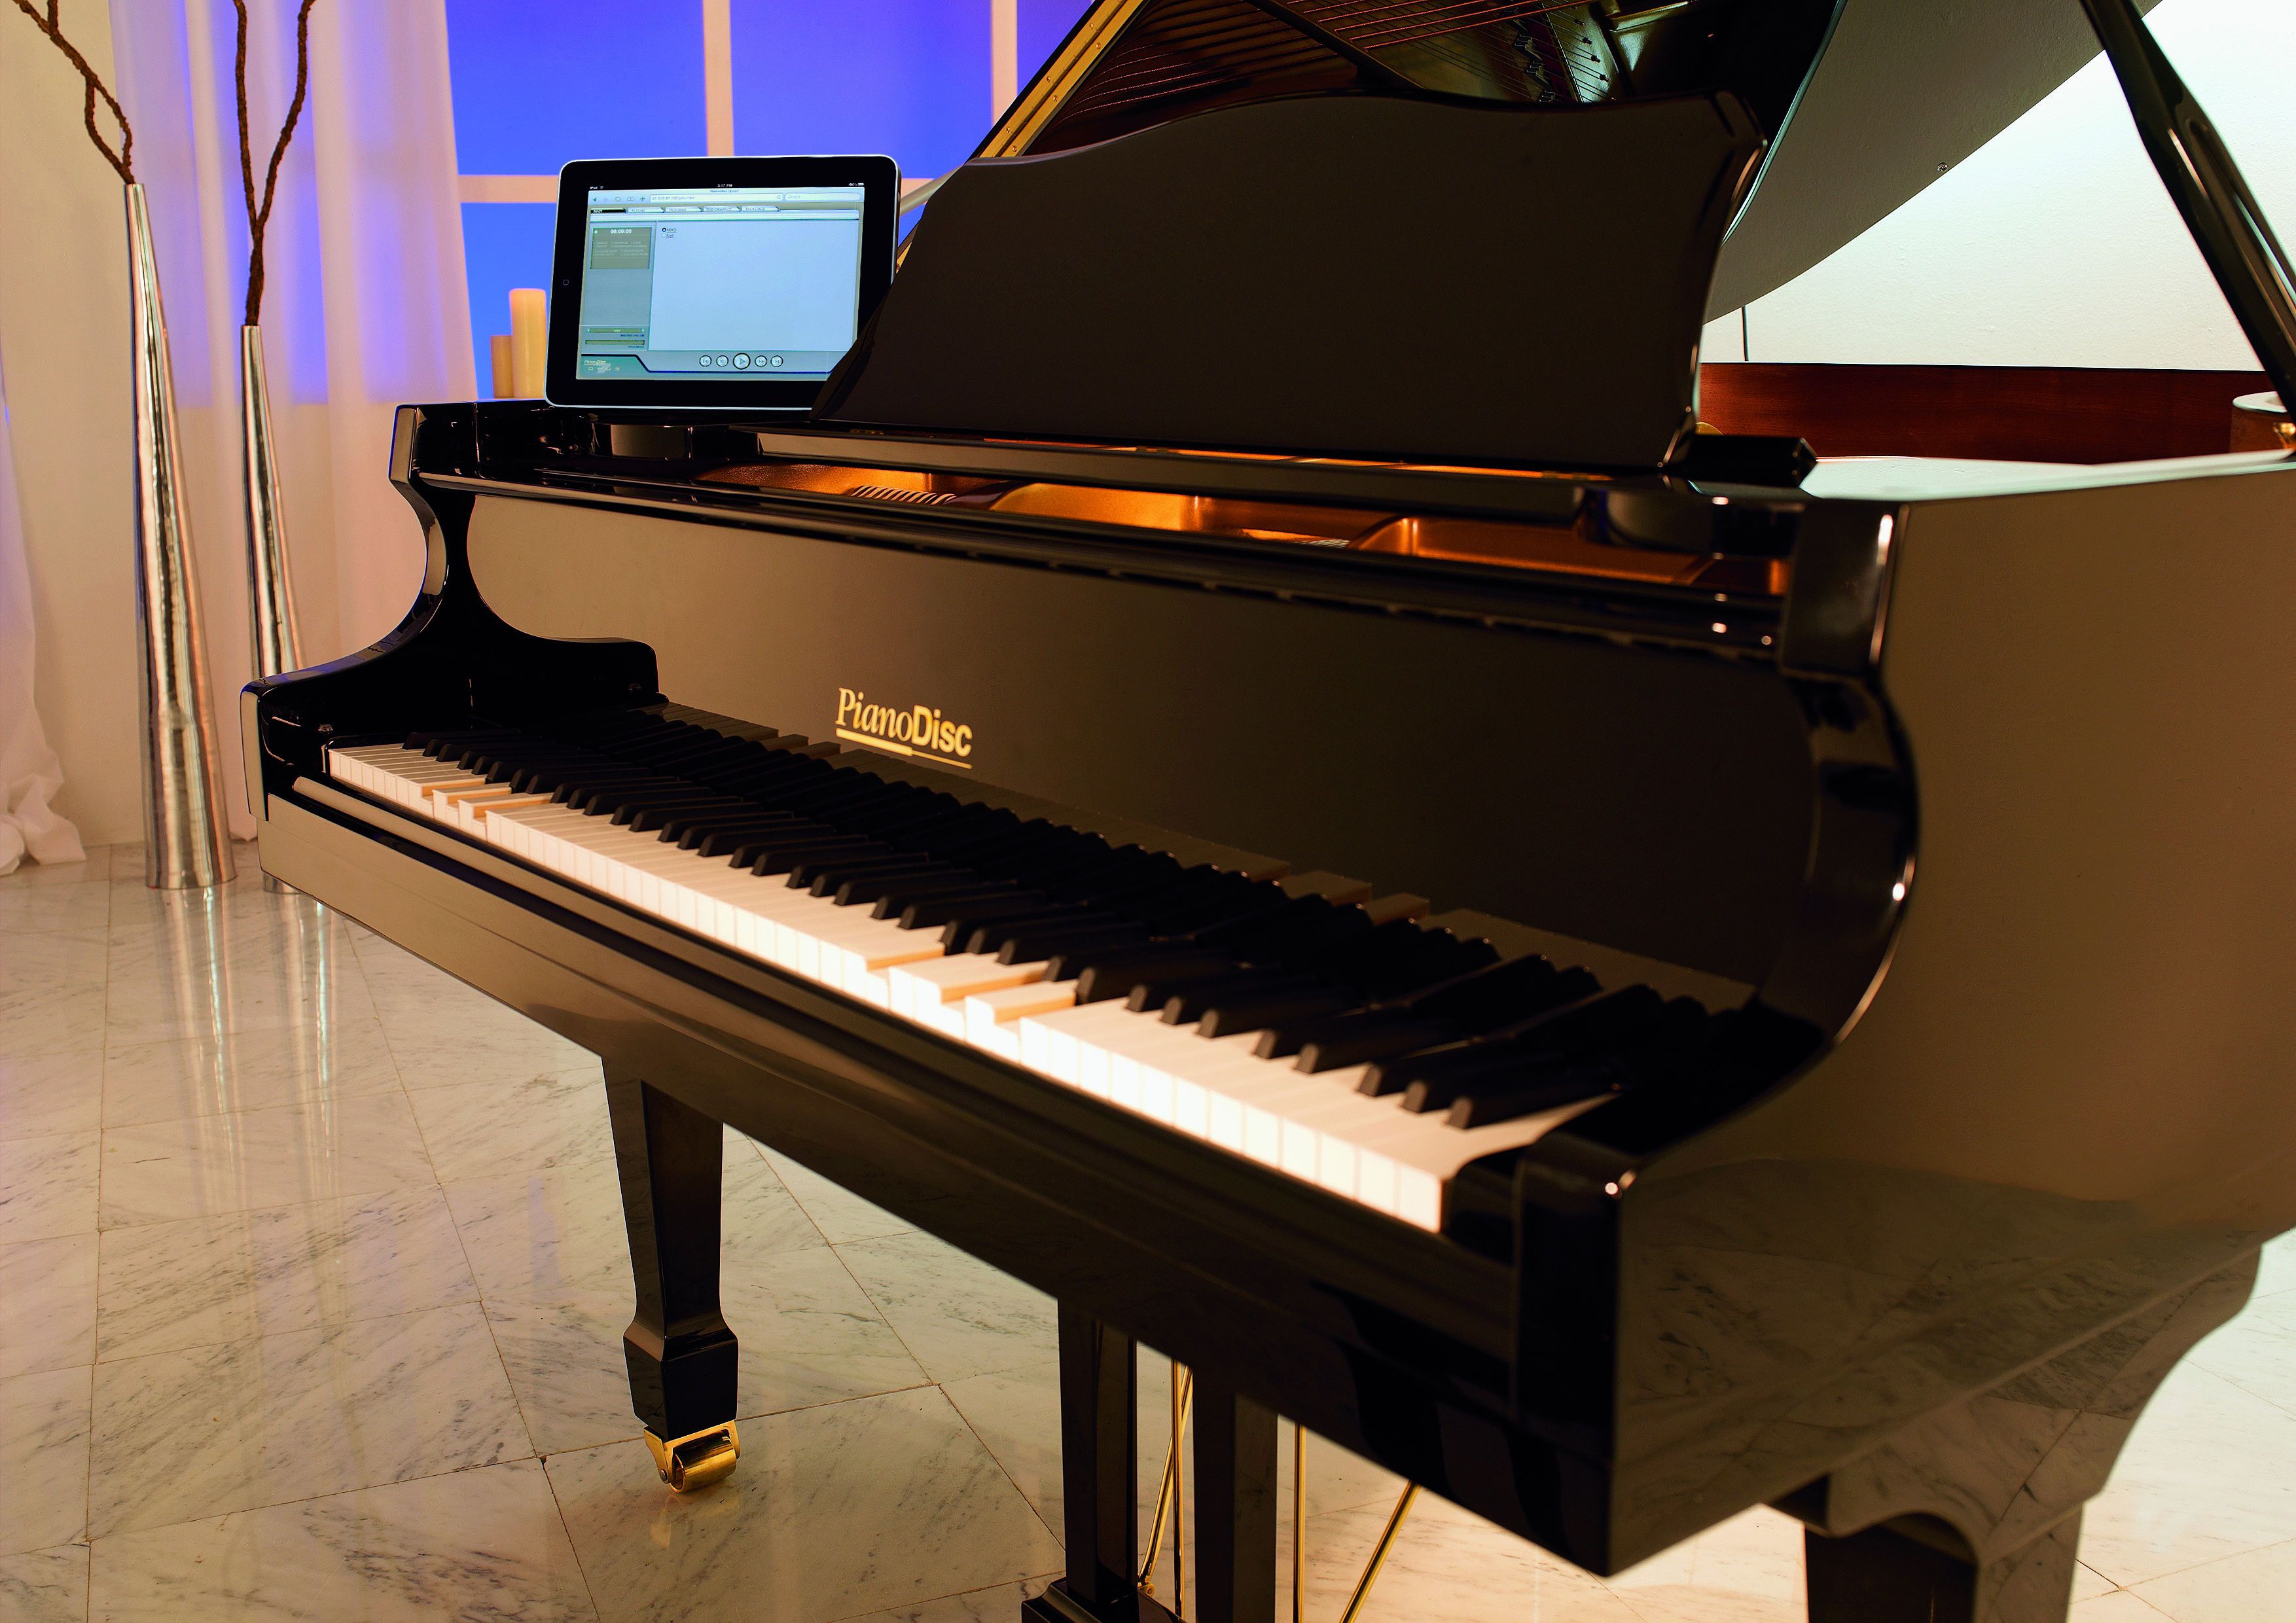 PianoDisc IQ iPad Air